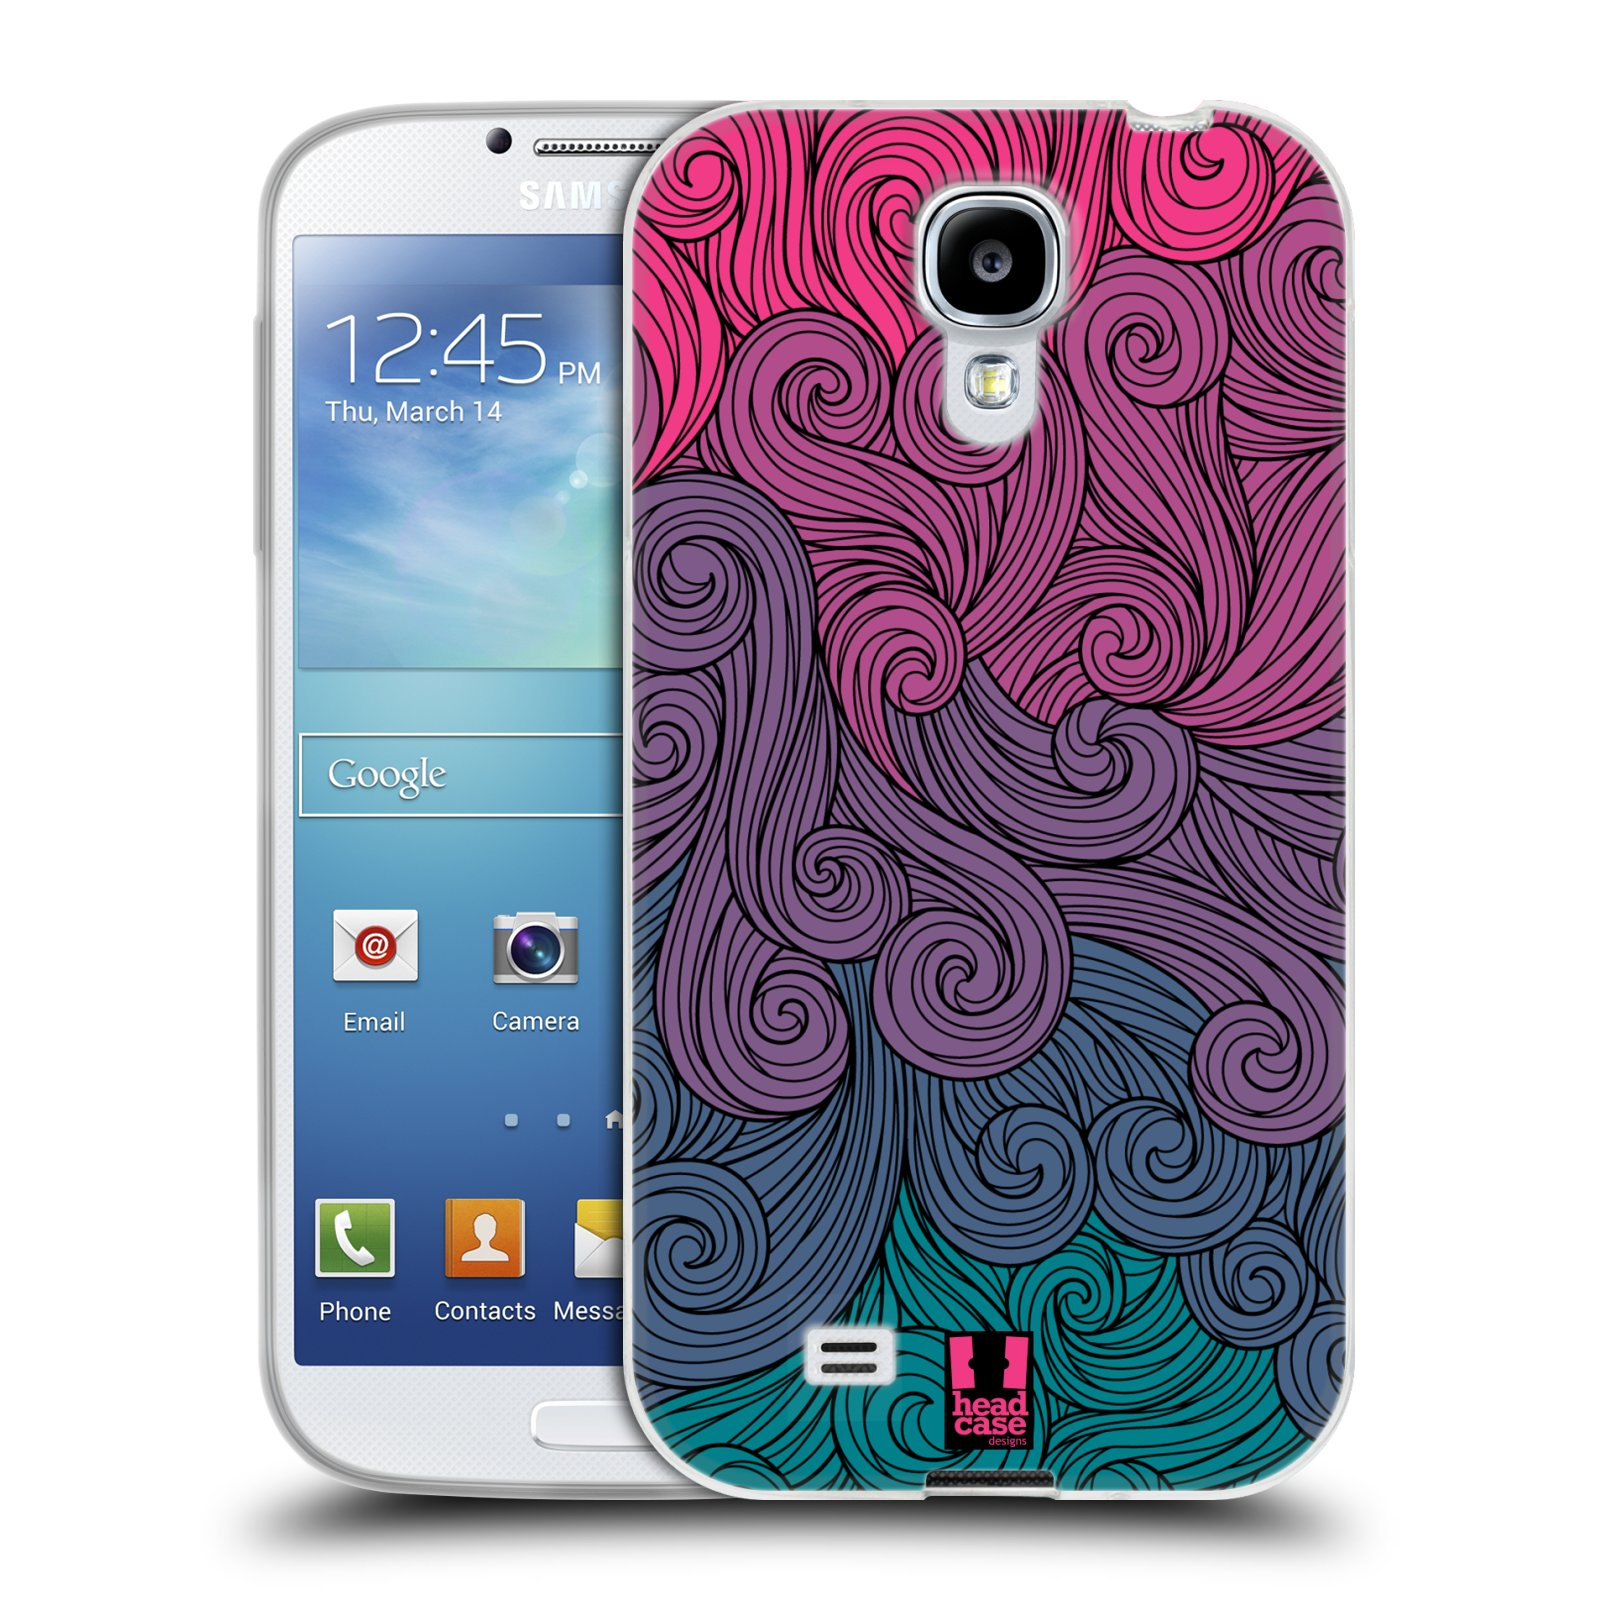 Silikonové pouzdro na mobil Samsung Galaxy S4 HEAD CASE Swirls Hot Pink (Silikonový kryt či obal na mobilní telefon Samsung Galaxy S4 GT-i9505 / i9500)